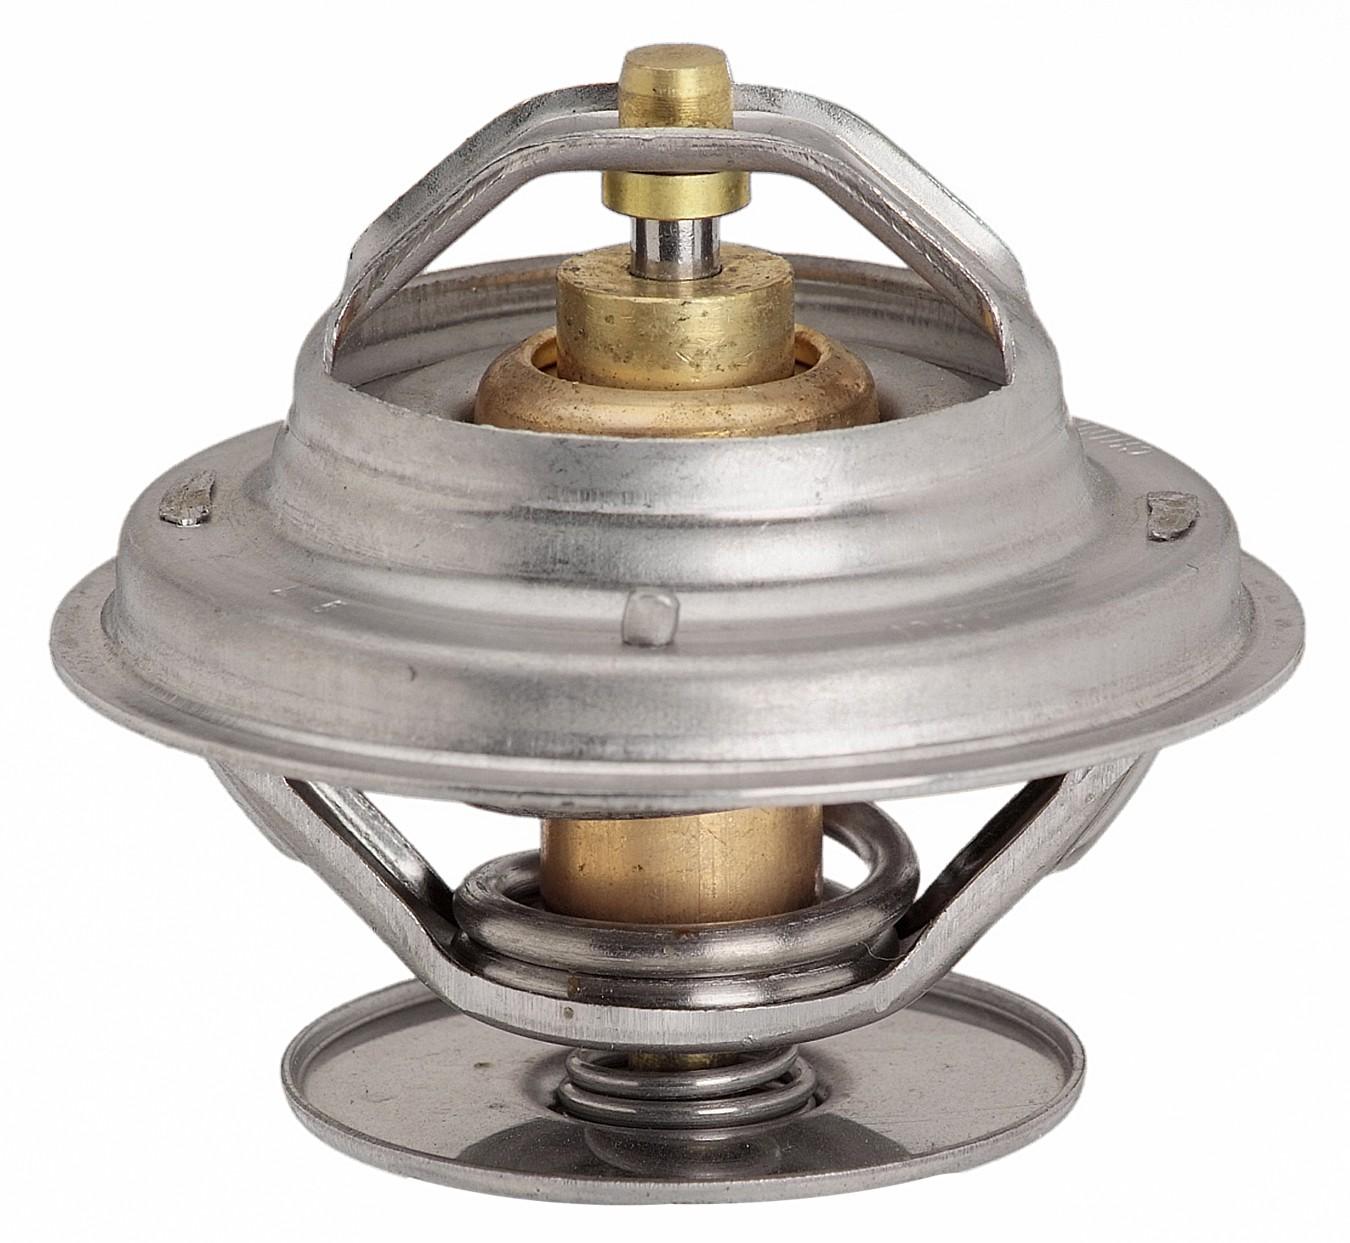 Cooling hm Stant Engine Coolant Thermostat for 1986-1991 Volkswagen Vanagon